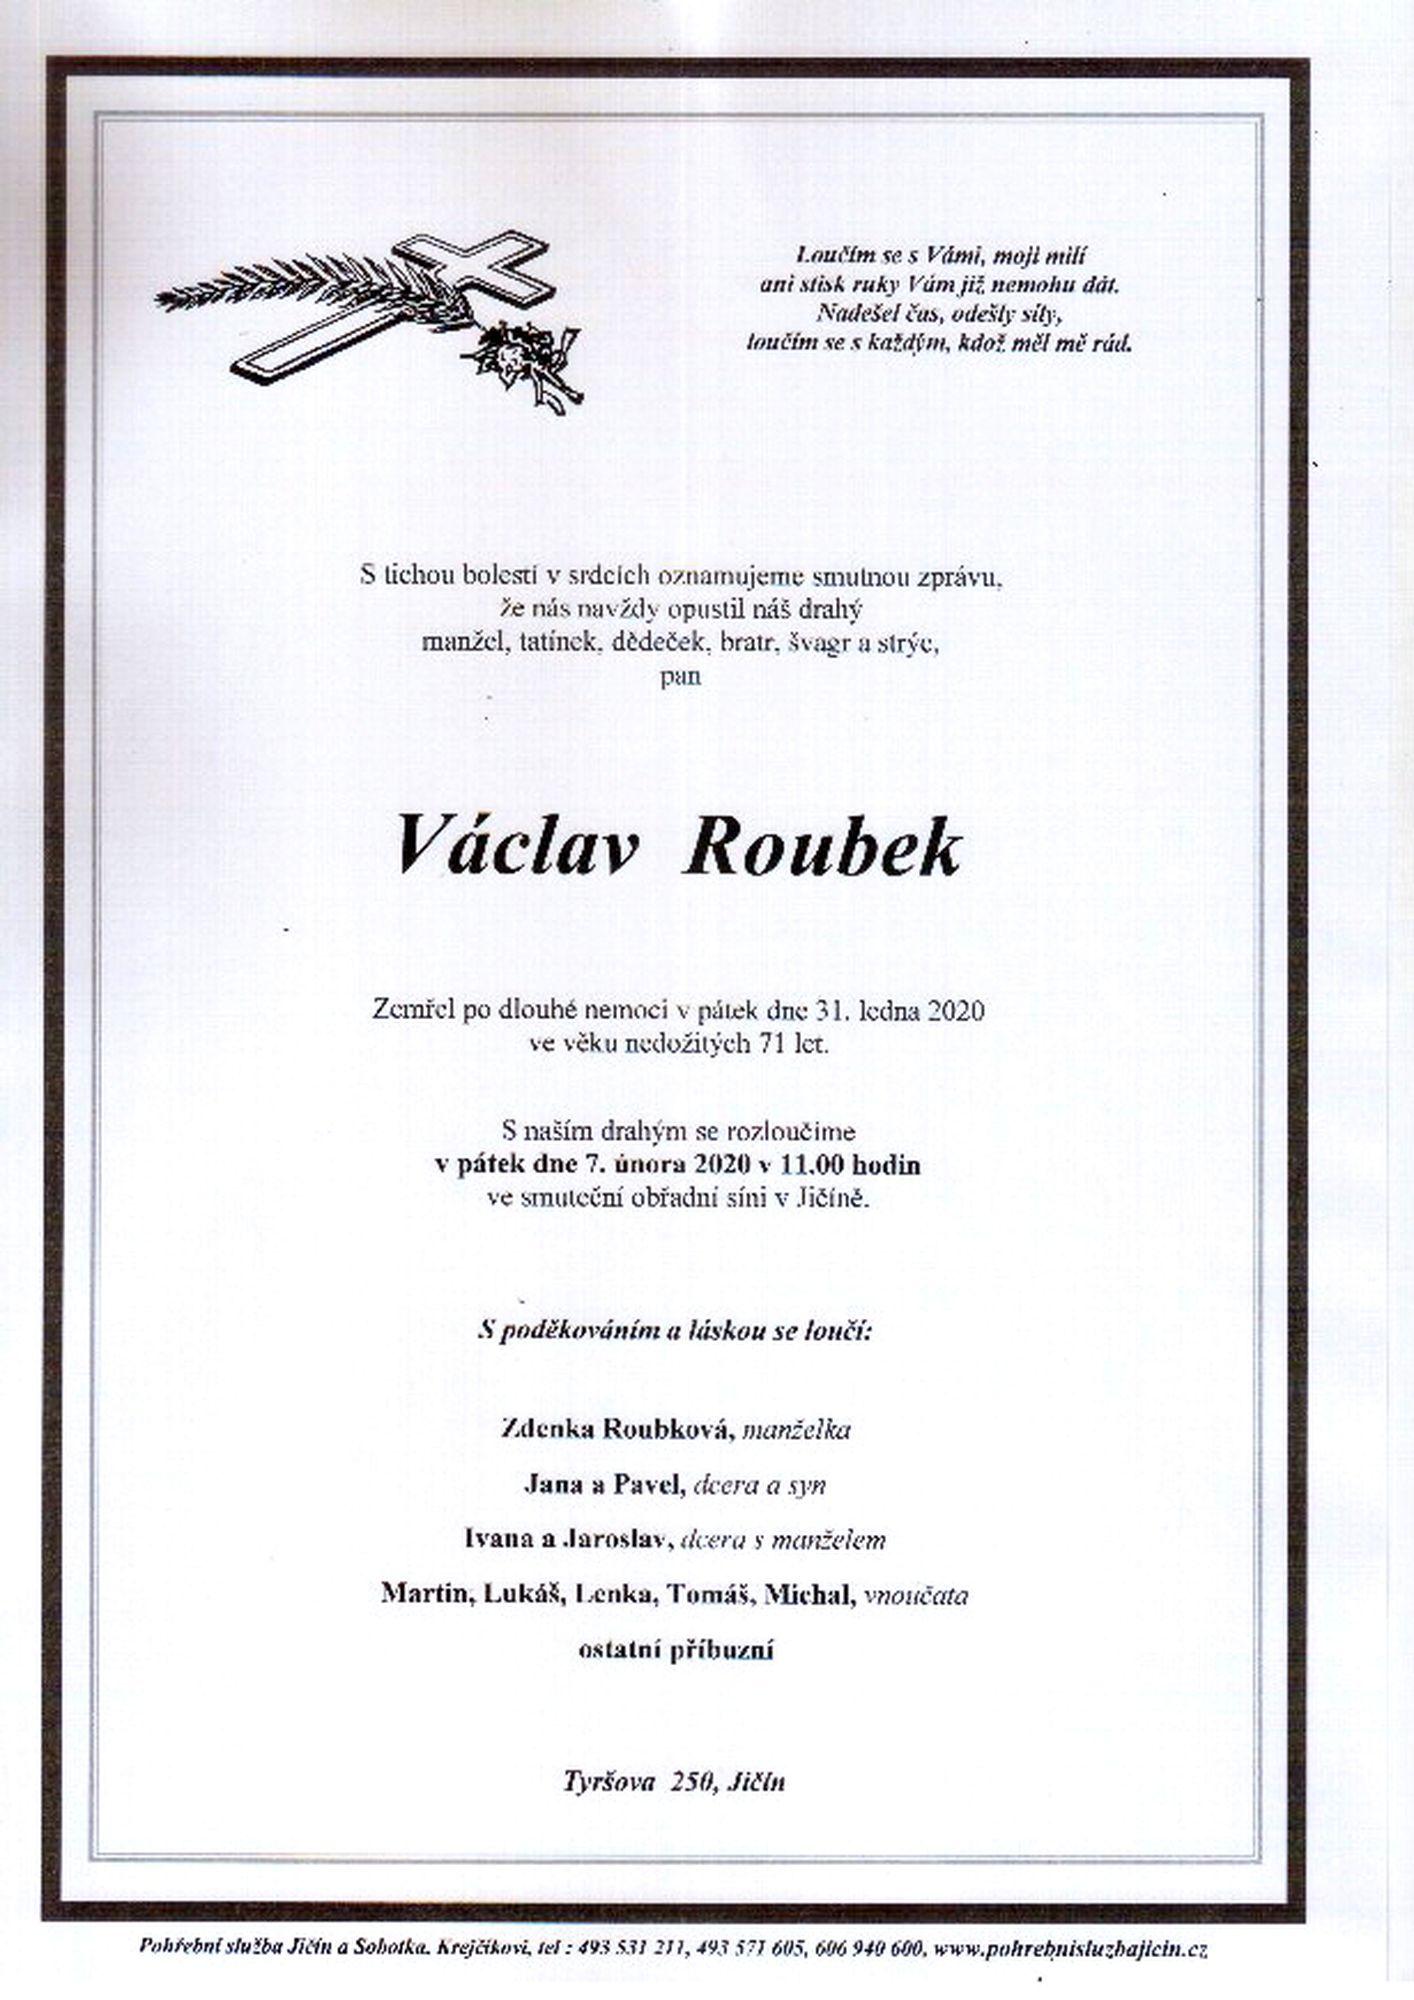 Václav Roubek